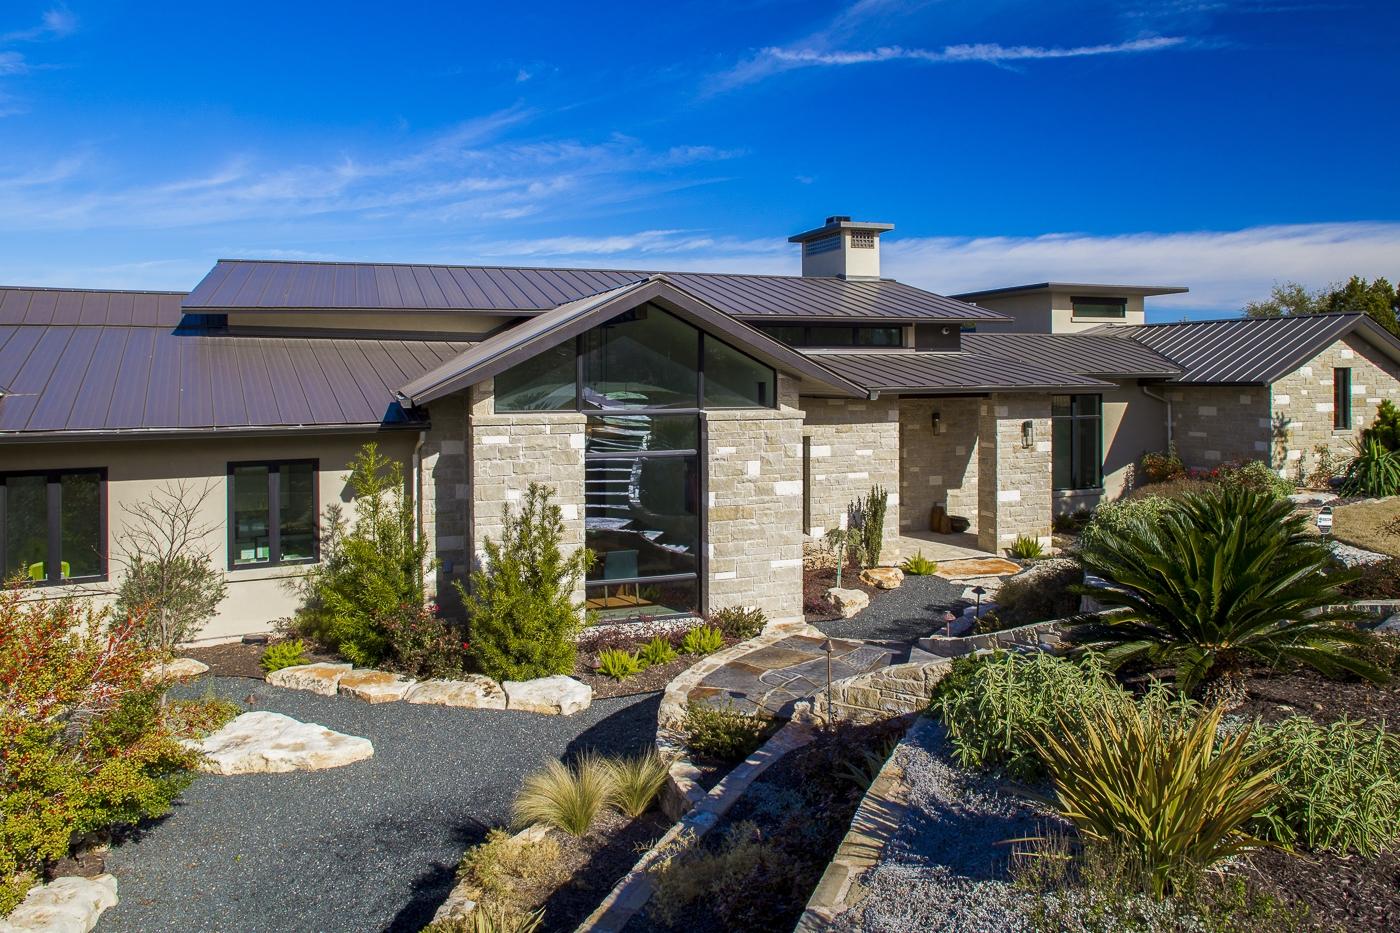 Best Kitchen Gallery: Awards Metropolitan Custom Homes of Home Builders In Austin on rachelxblog.com